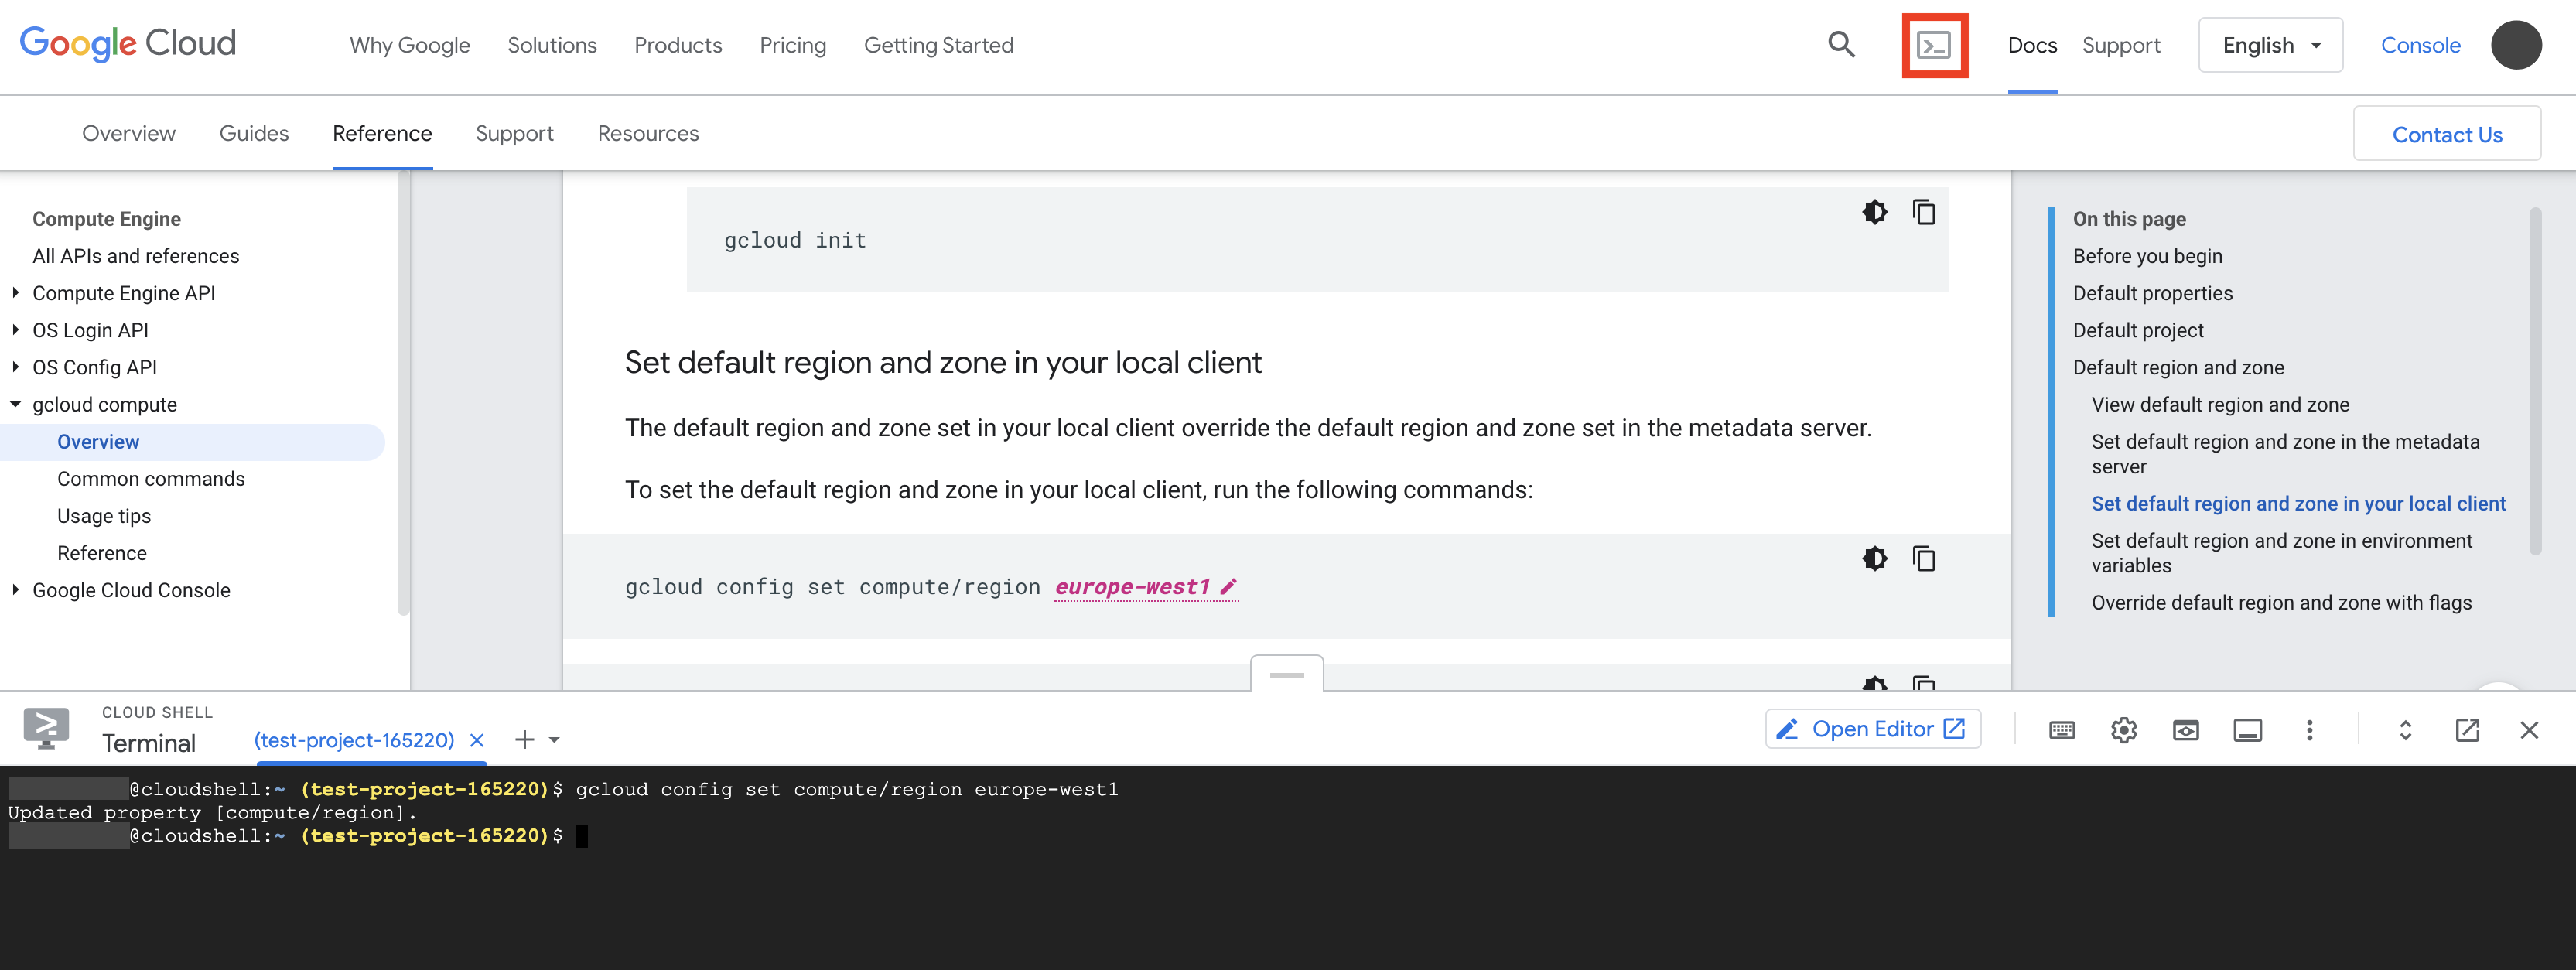 Cloud Shell 终端在文档页面的下半部分启动,并将 gcloud 命令示例复制到 Cloud Shell 终端